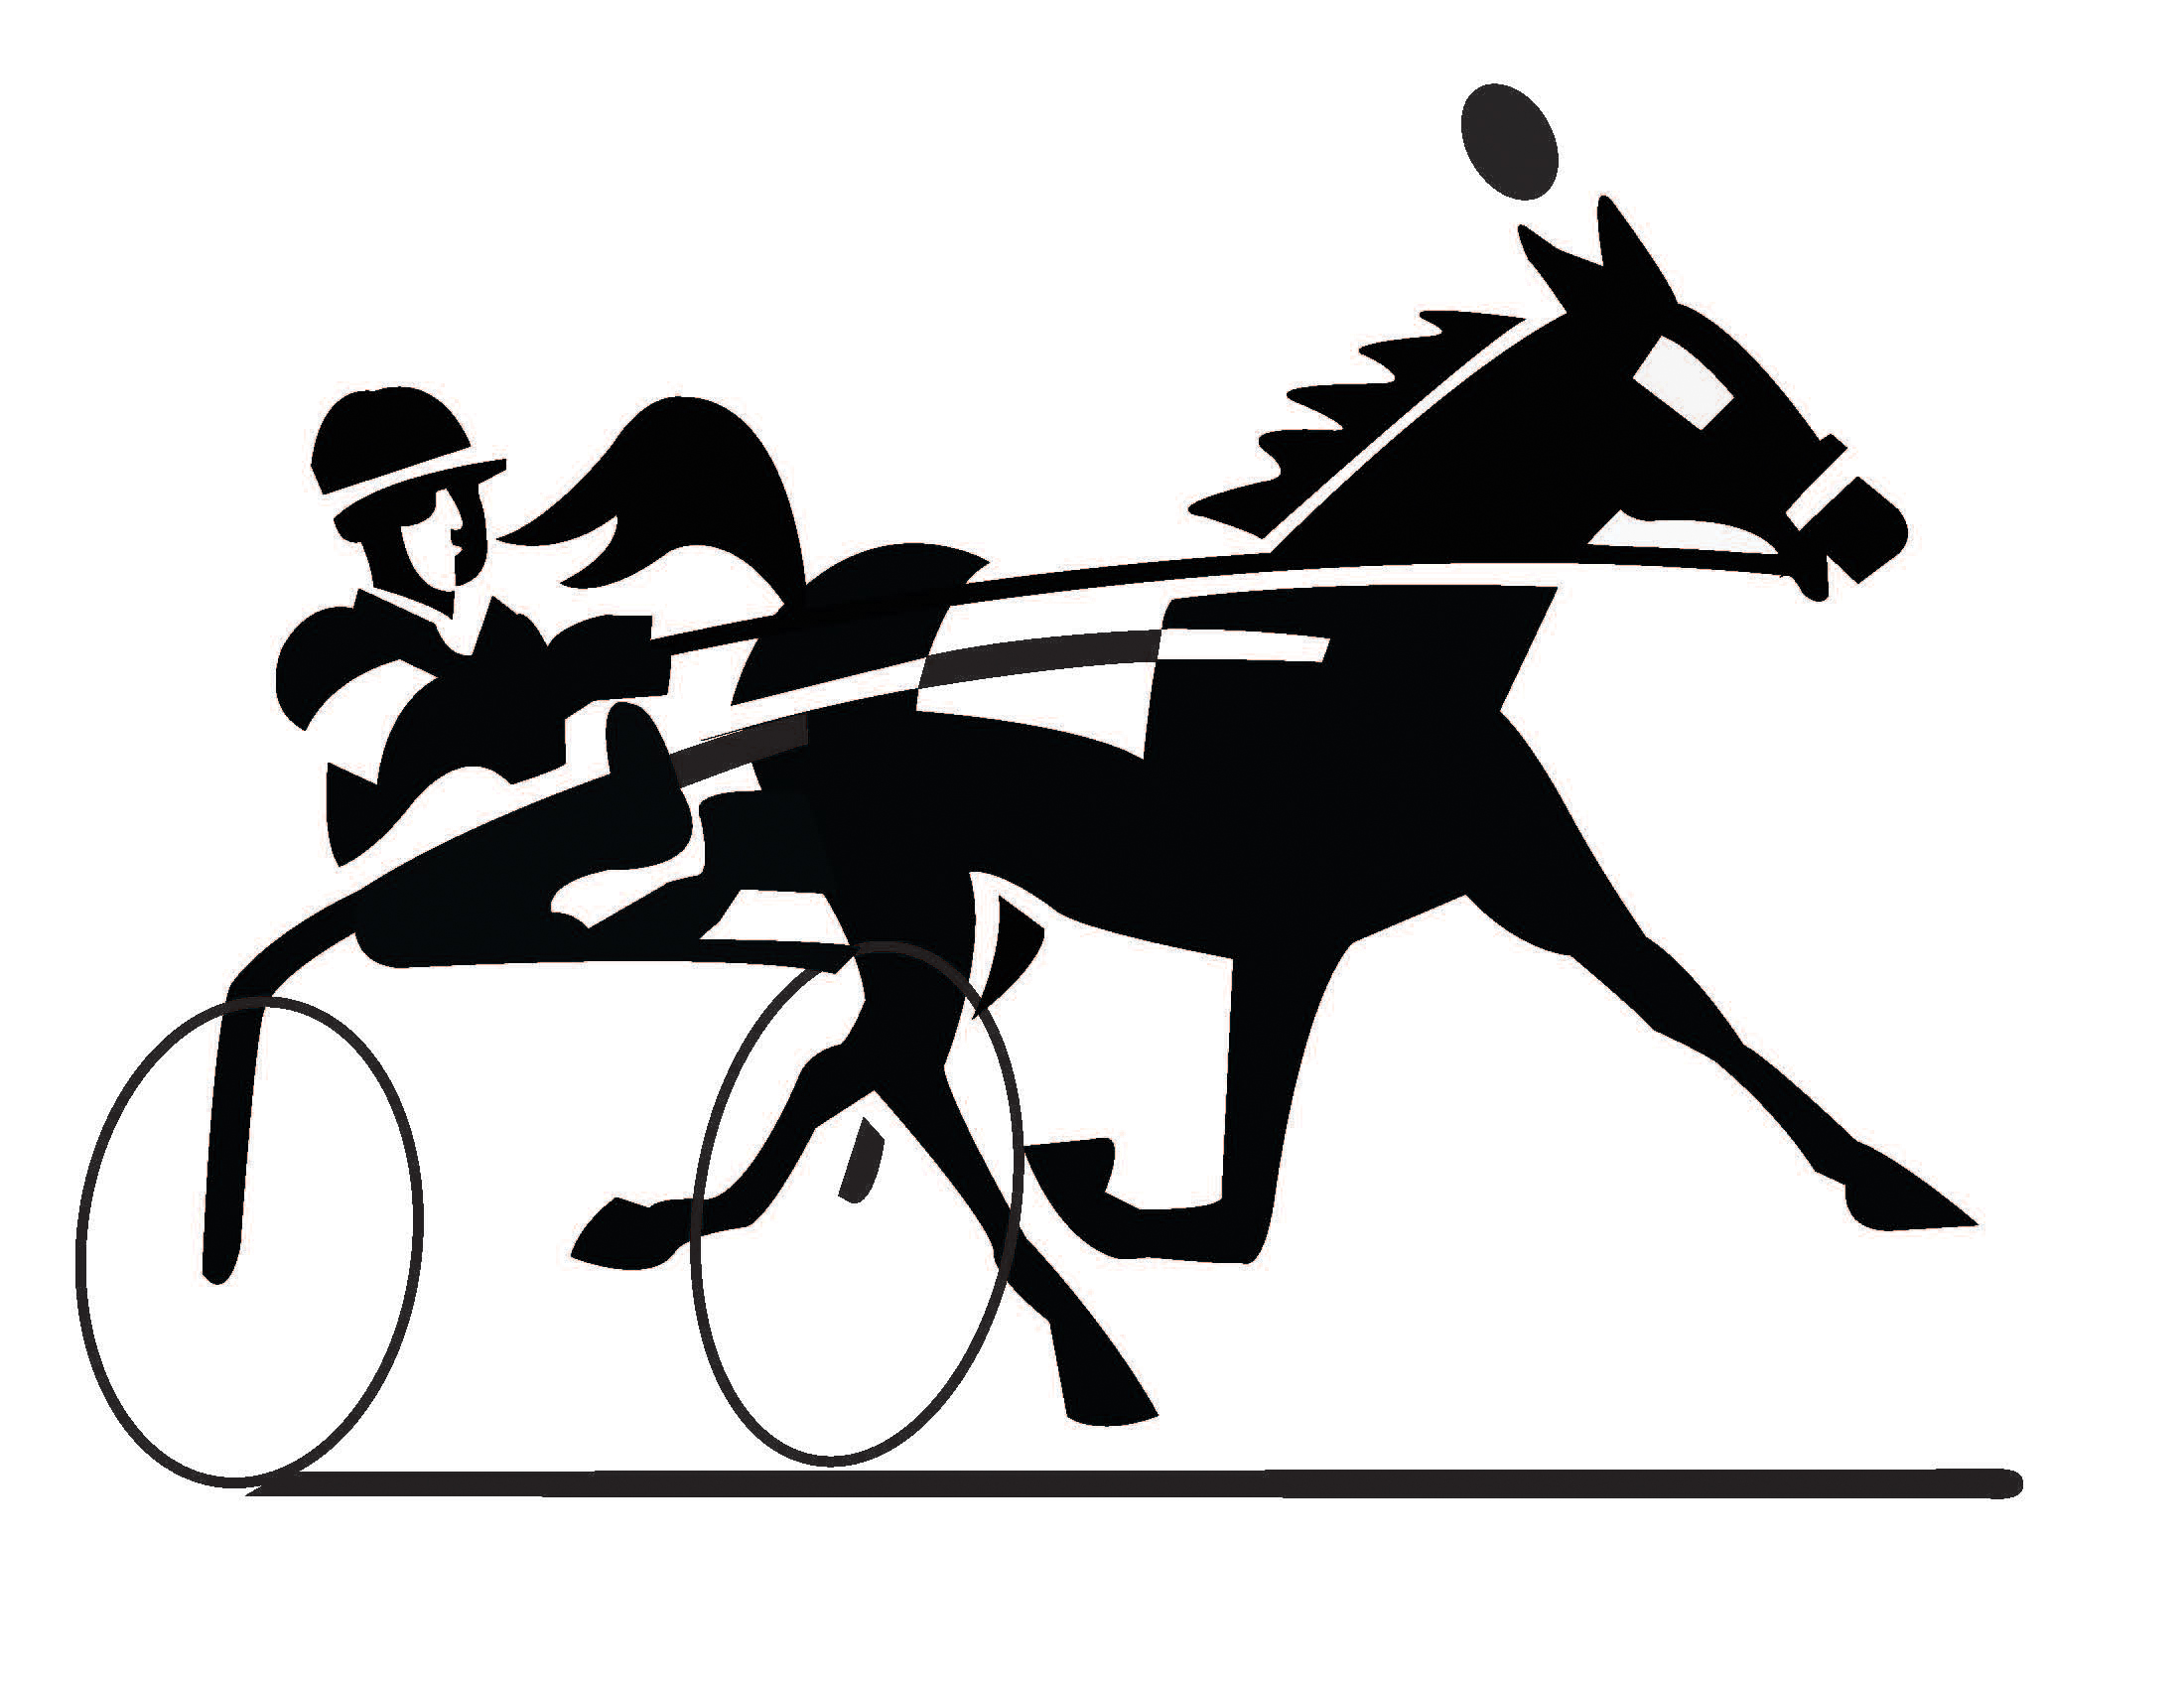 Horse racing racing clip art free image 3